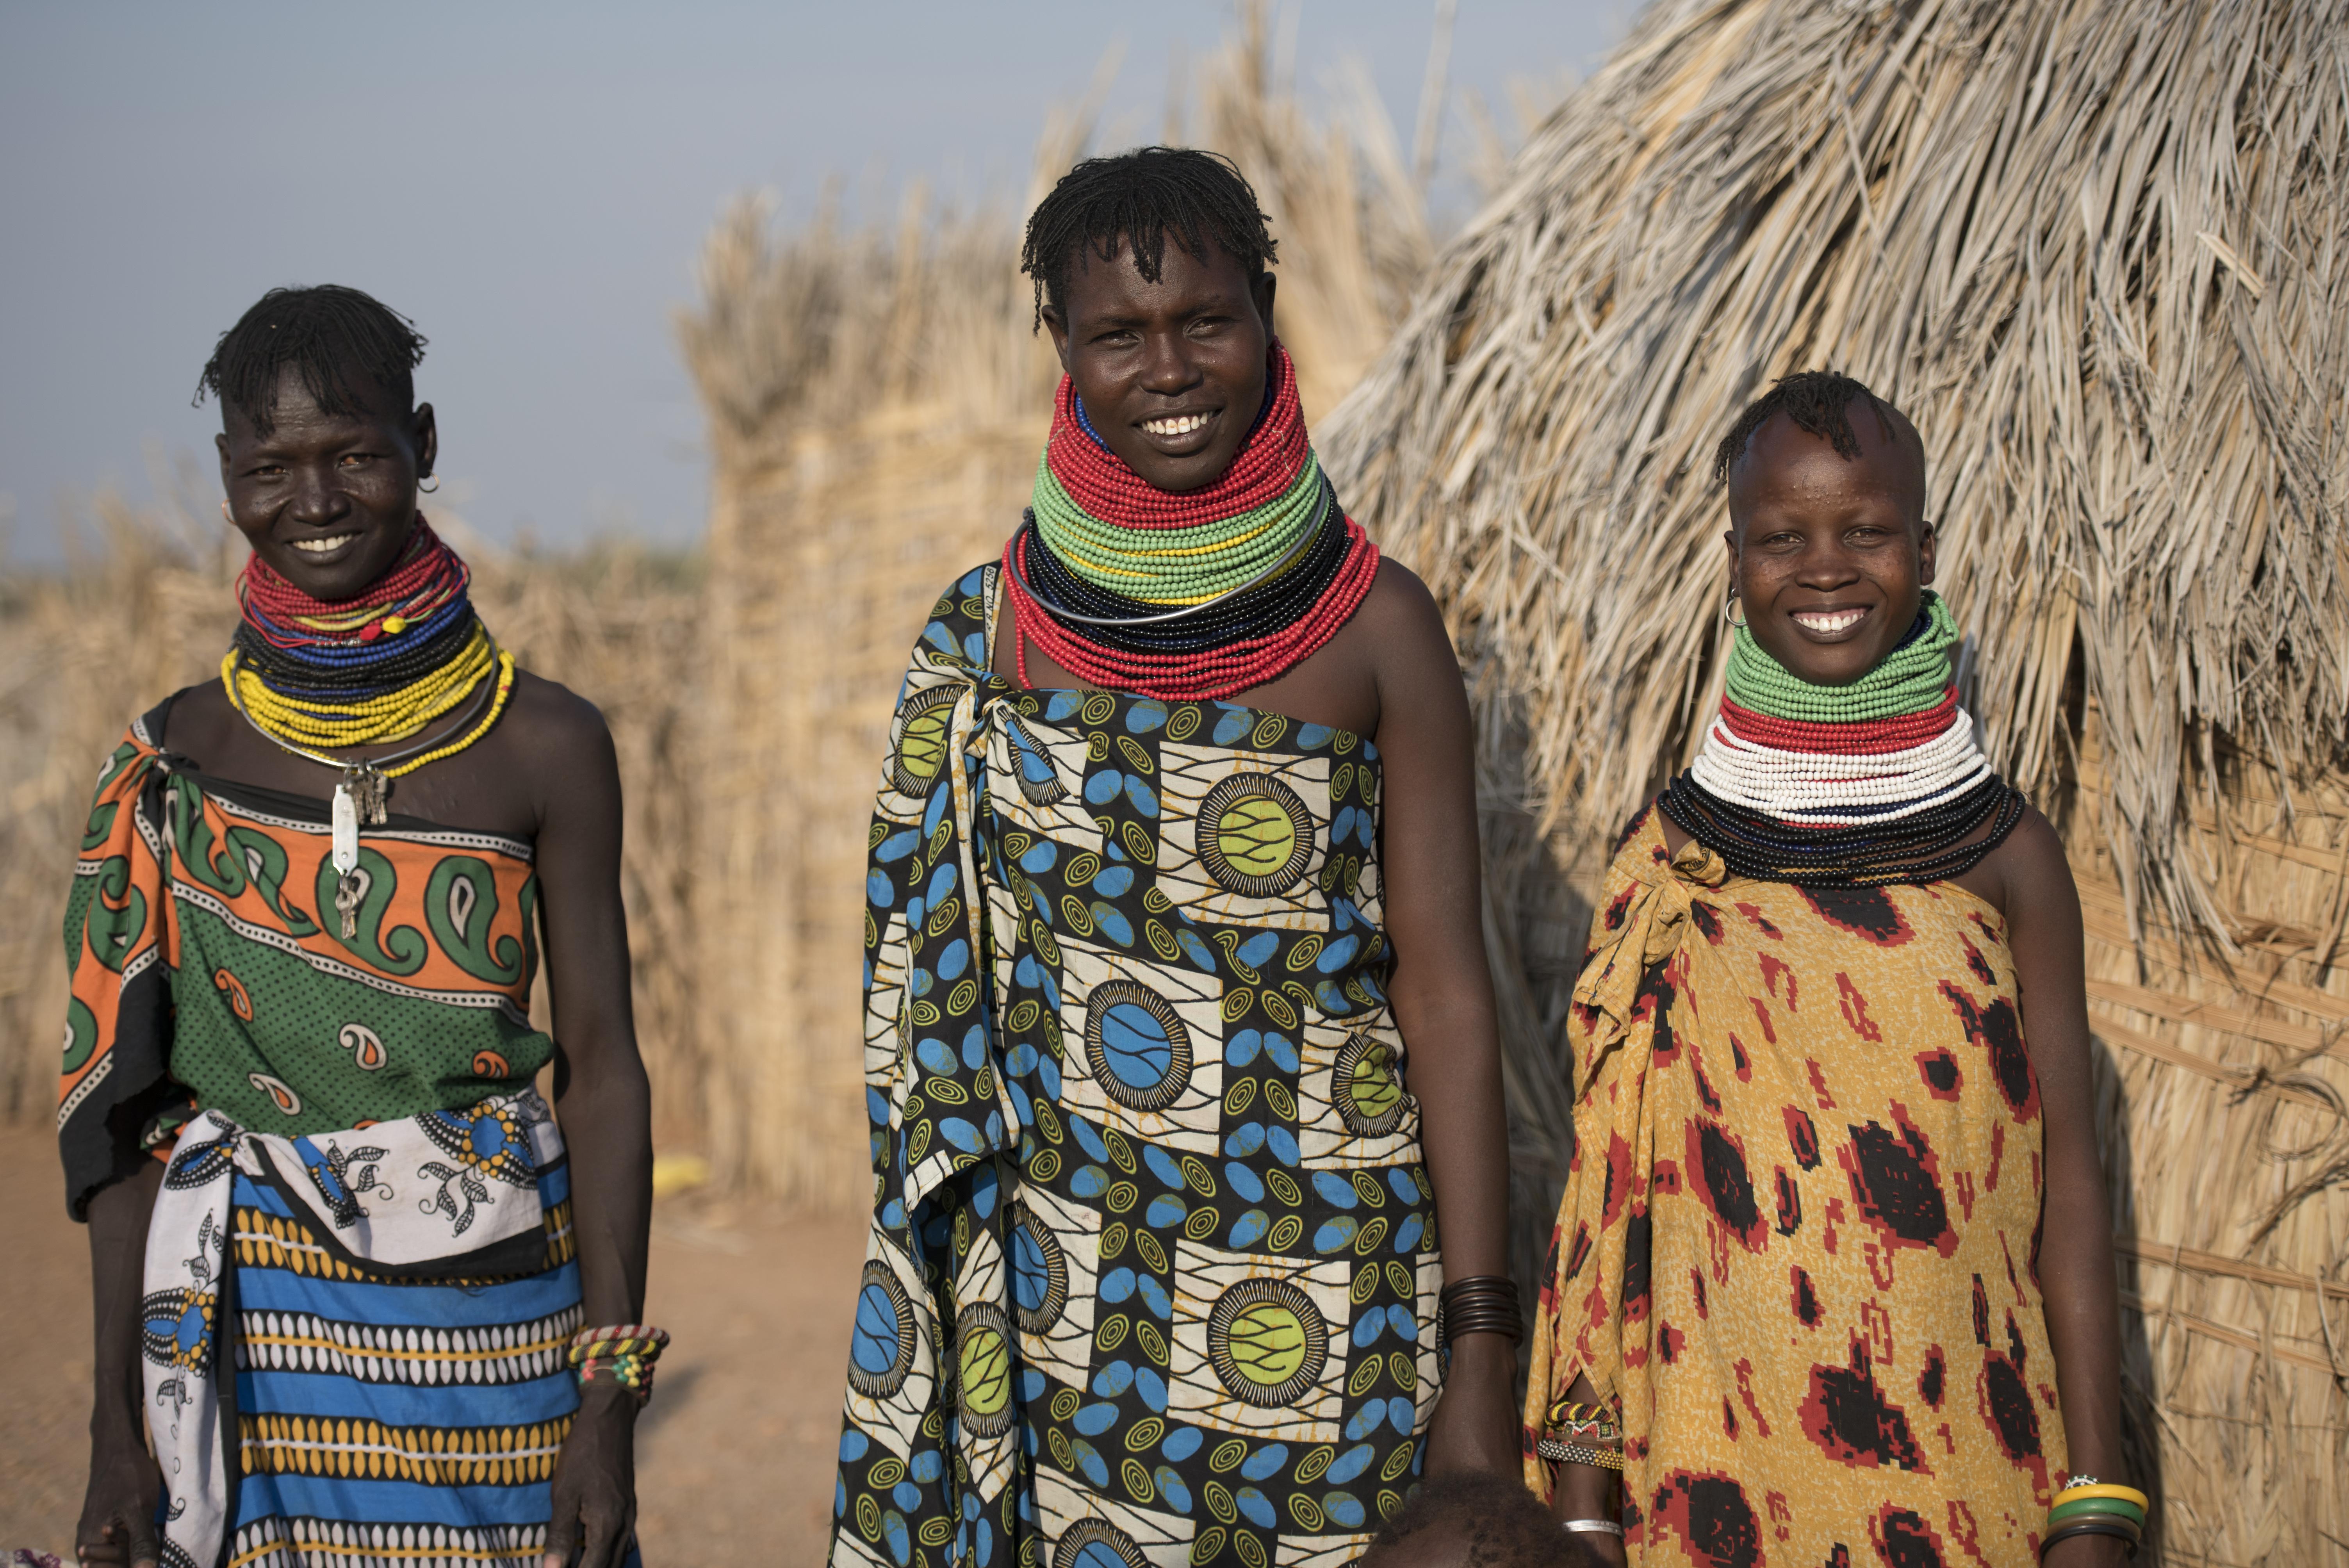 Photo of three women in their village in the Turkana region of Northwestern Kenya